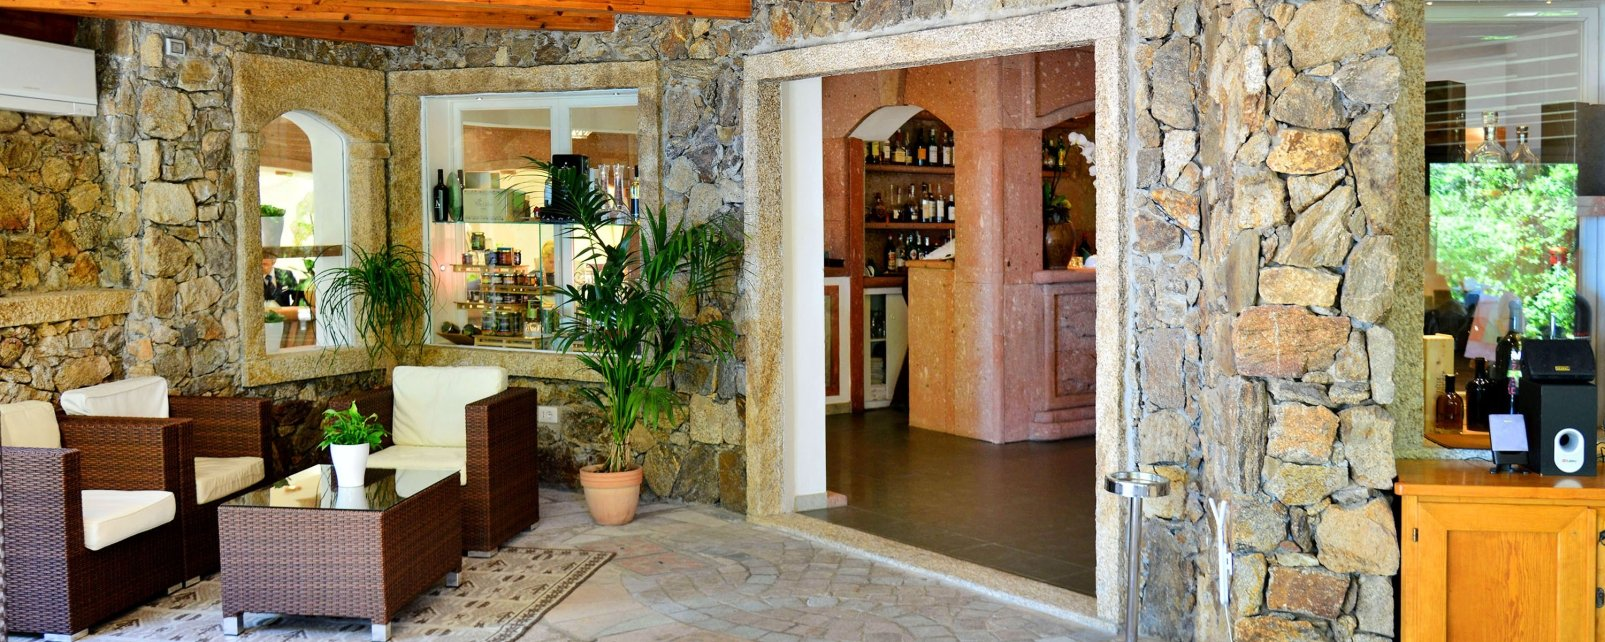 Hotel Hôtel Capo d'Orso Thalasso Spa